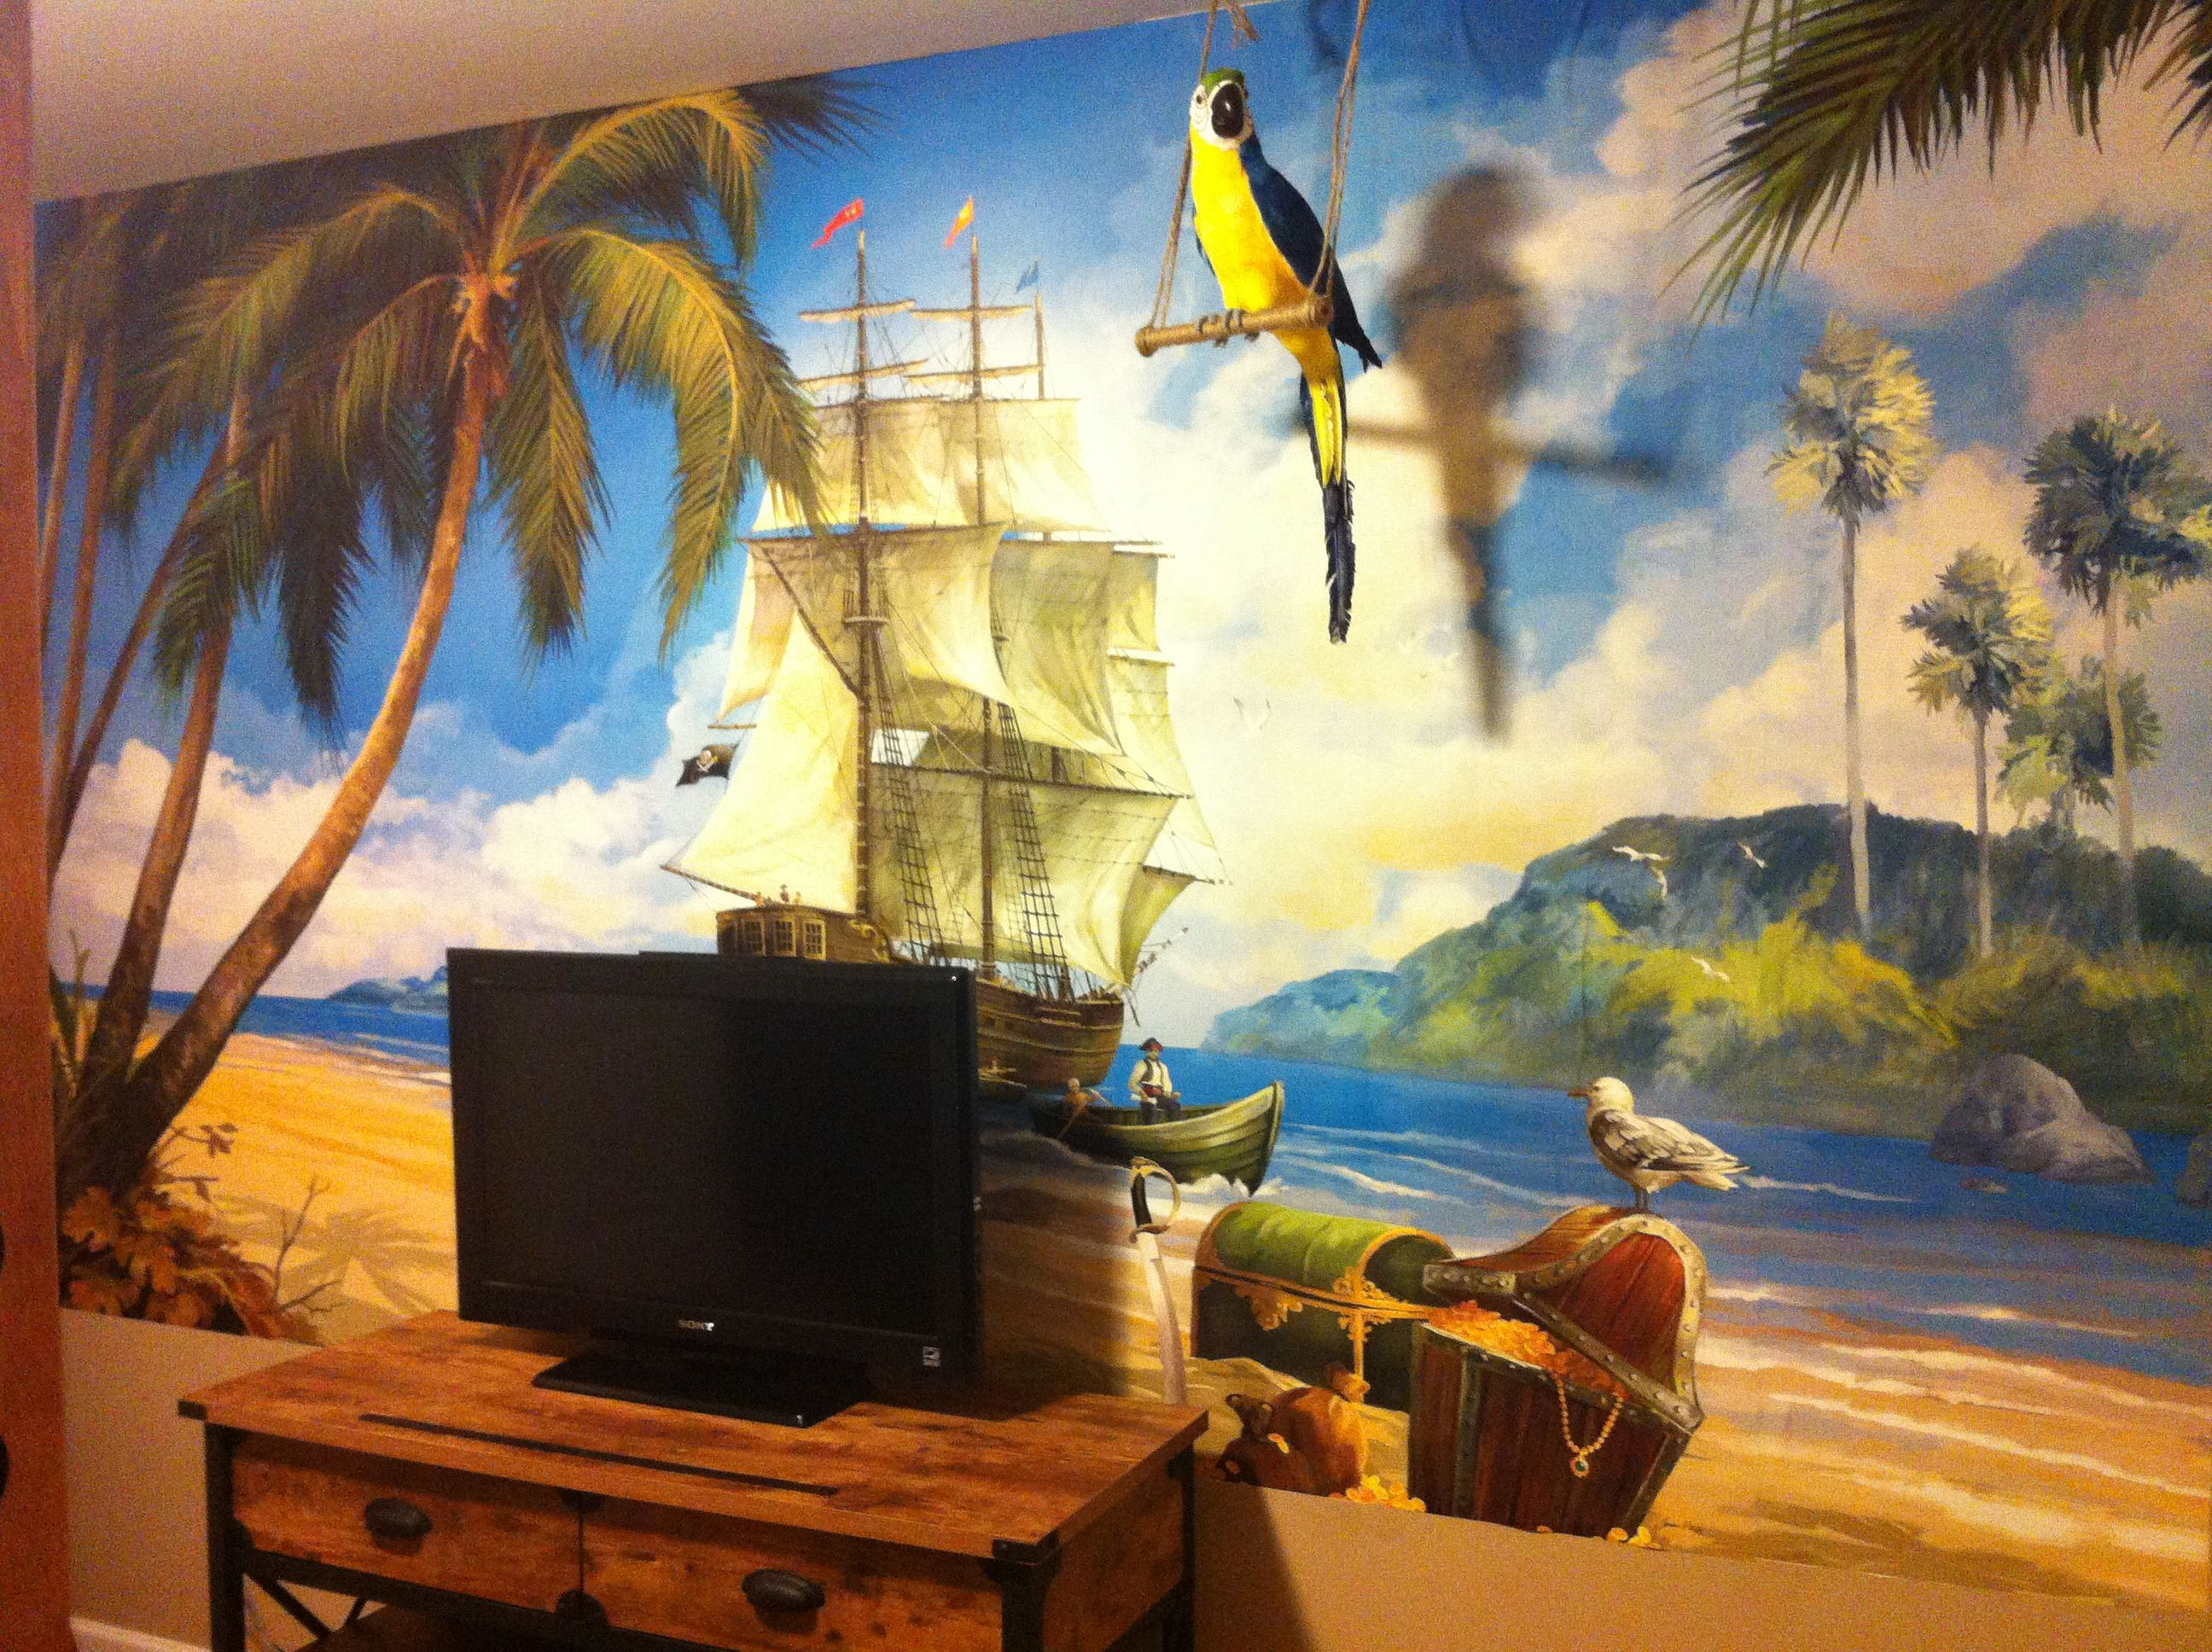 pirate wall mural my bedroom pinterest wall murals environmental graphics egi pirates wall mural